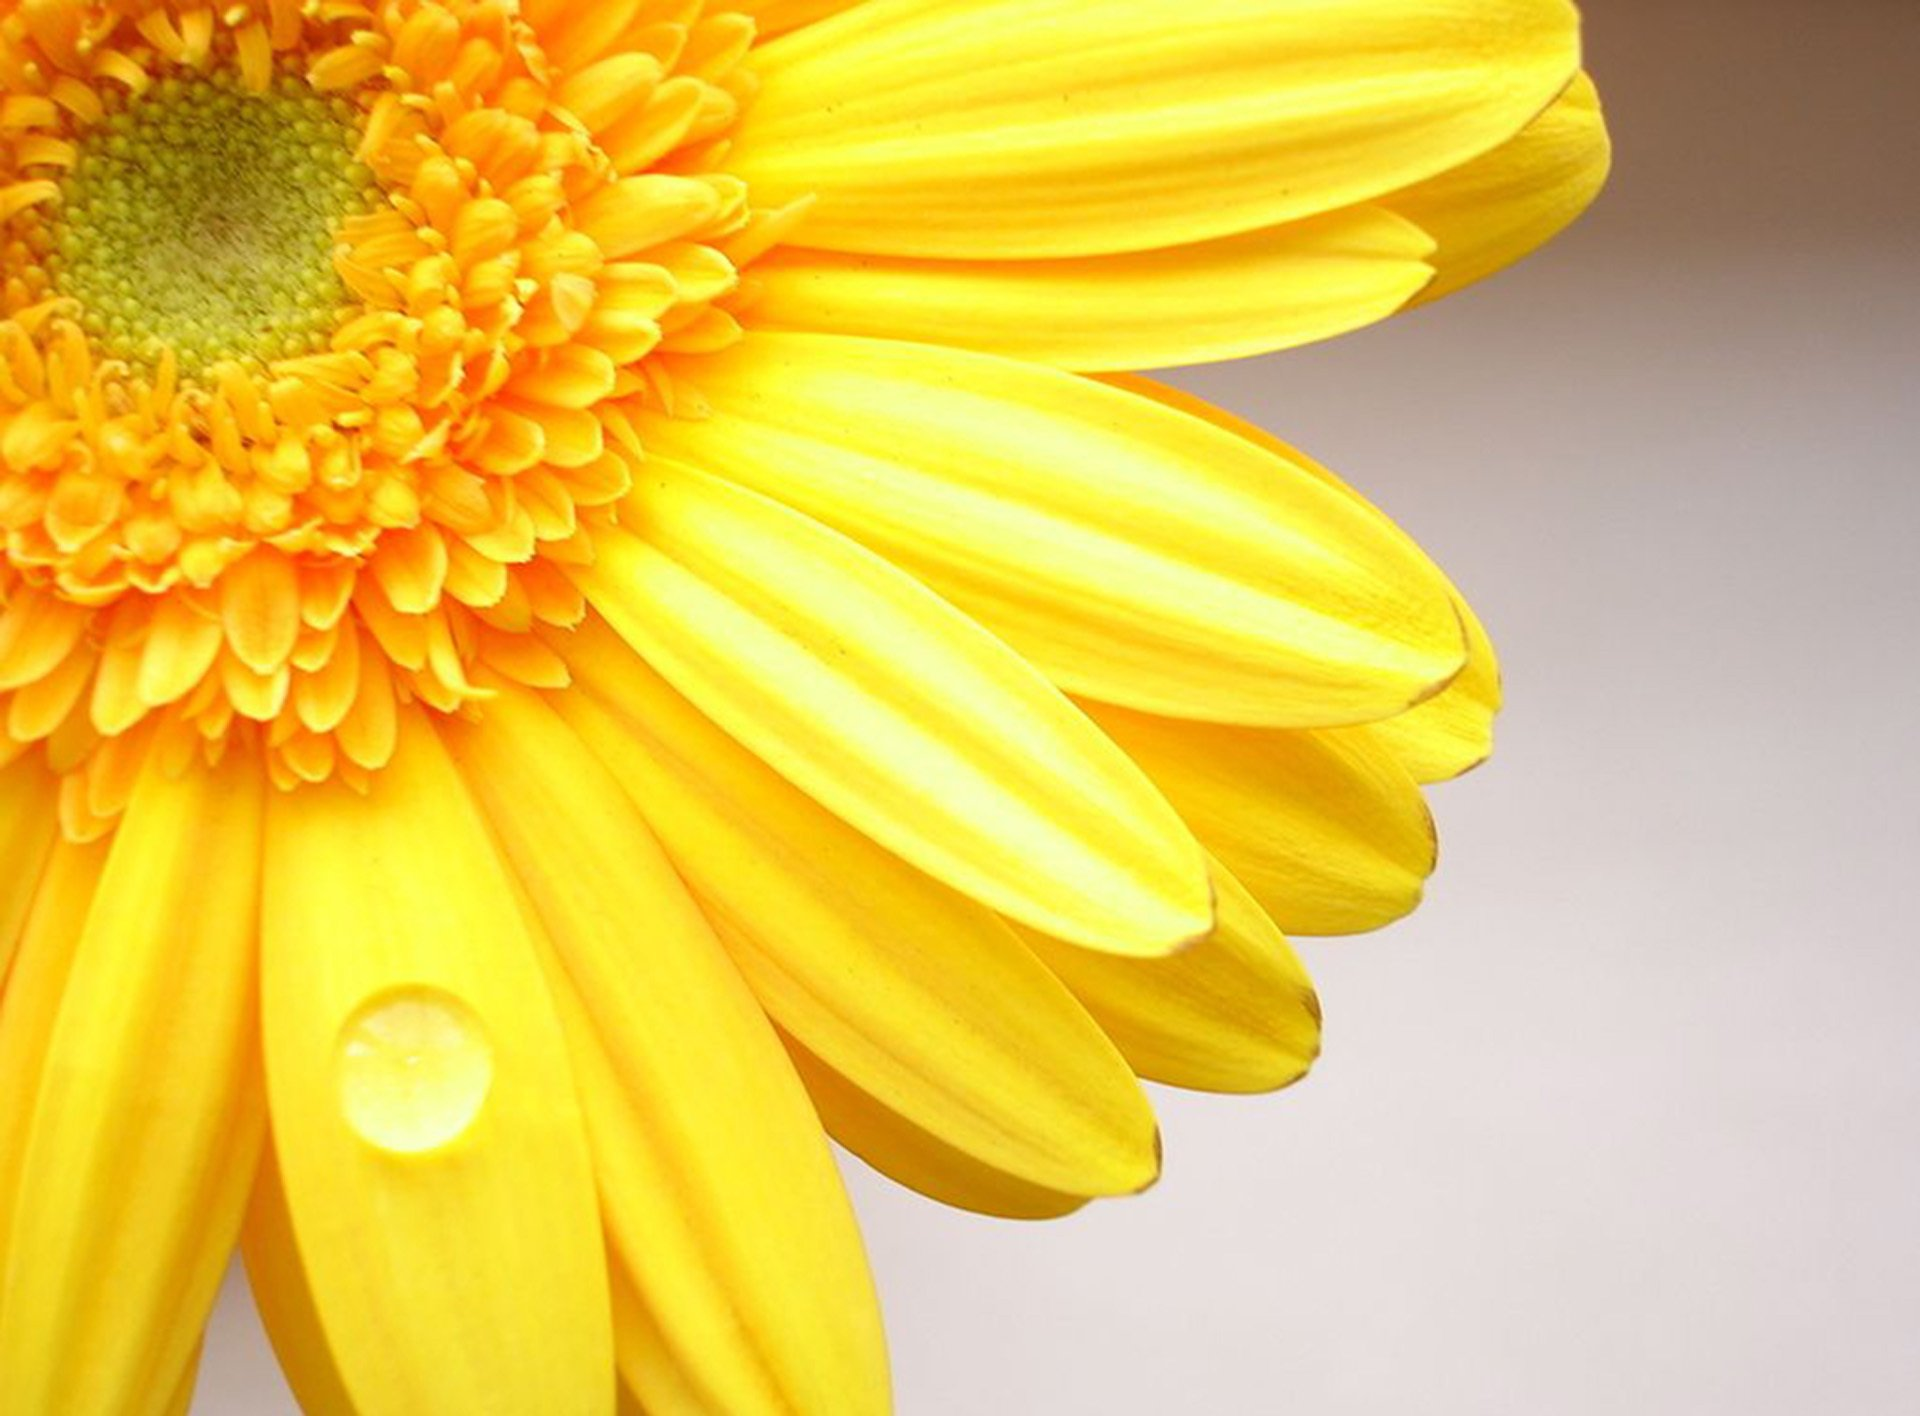 природа крупный план цветы желтые nature large plan flowers yellow бесплатно